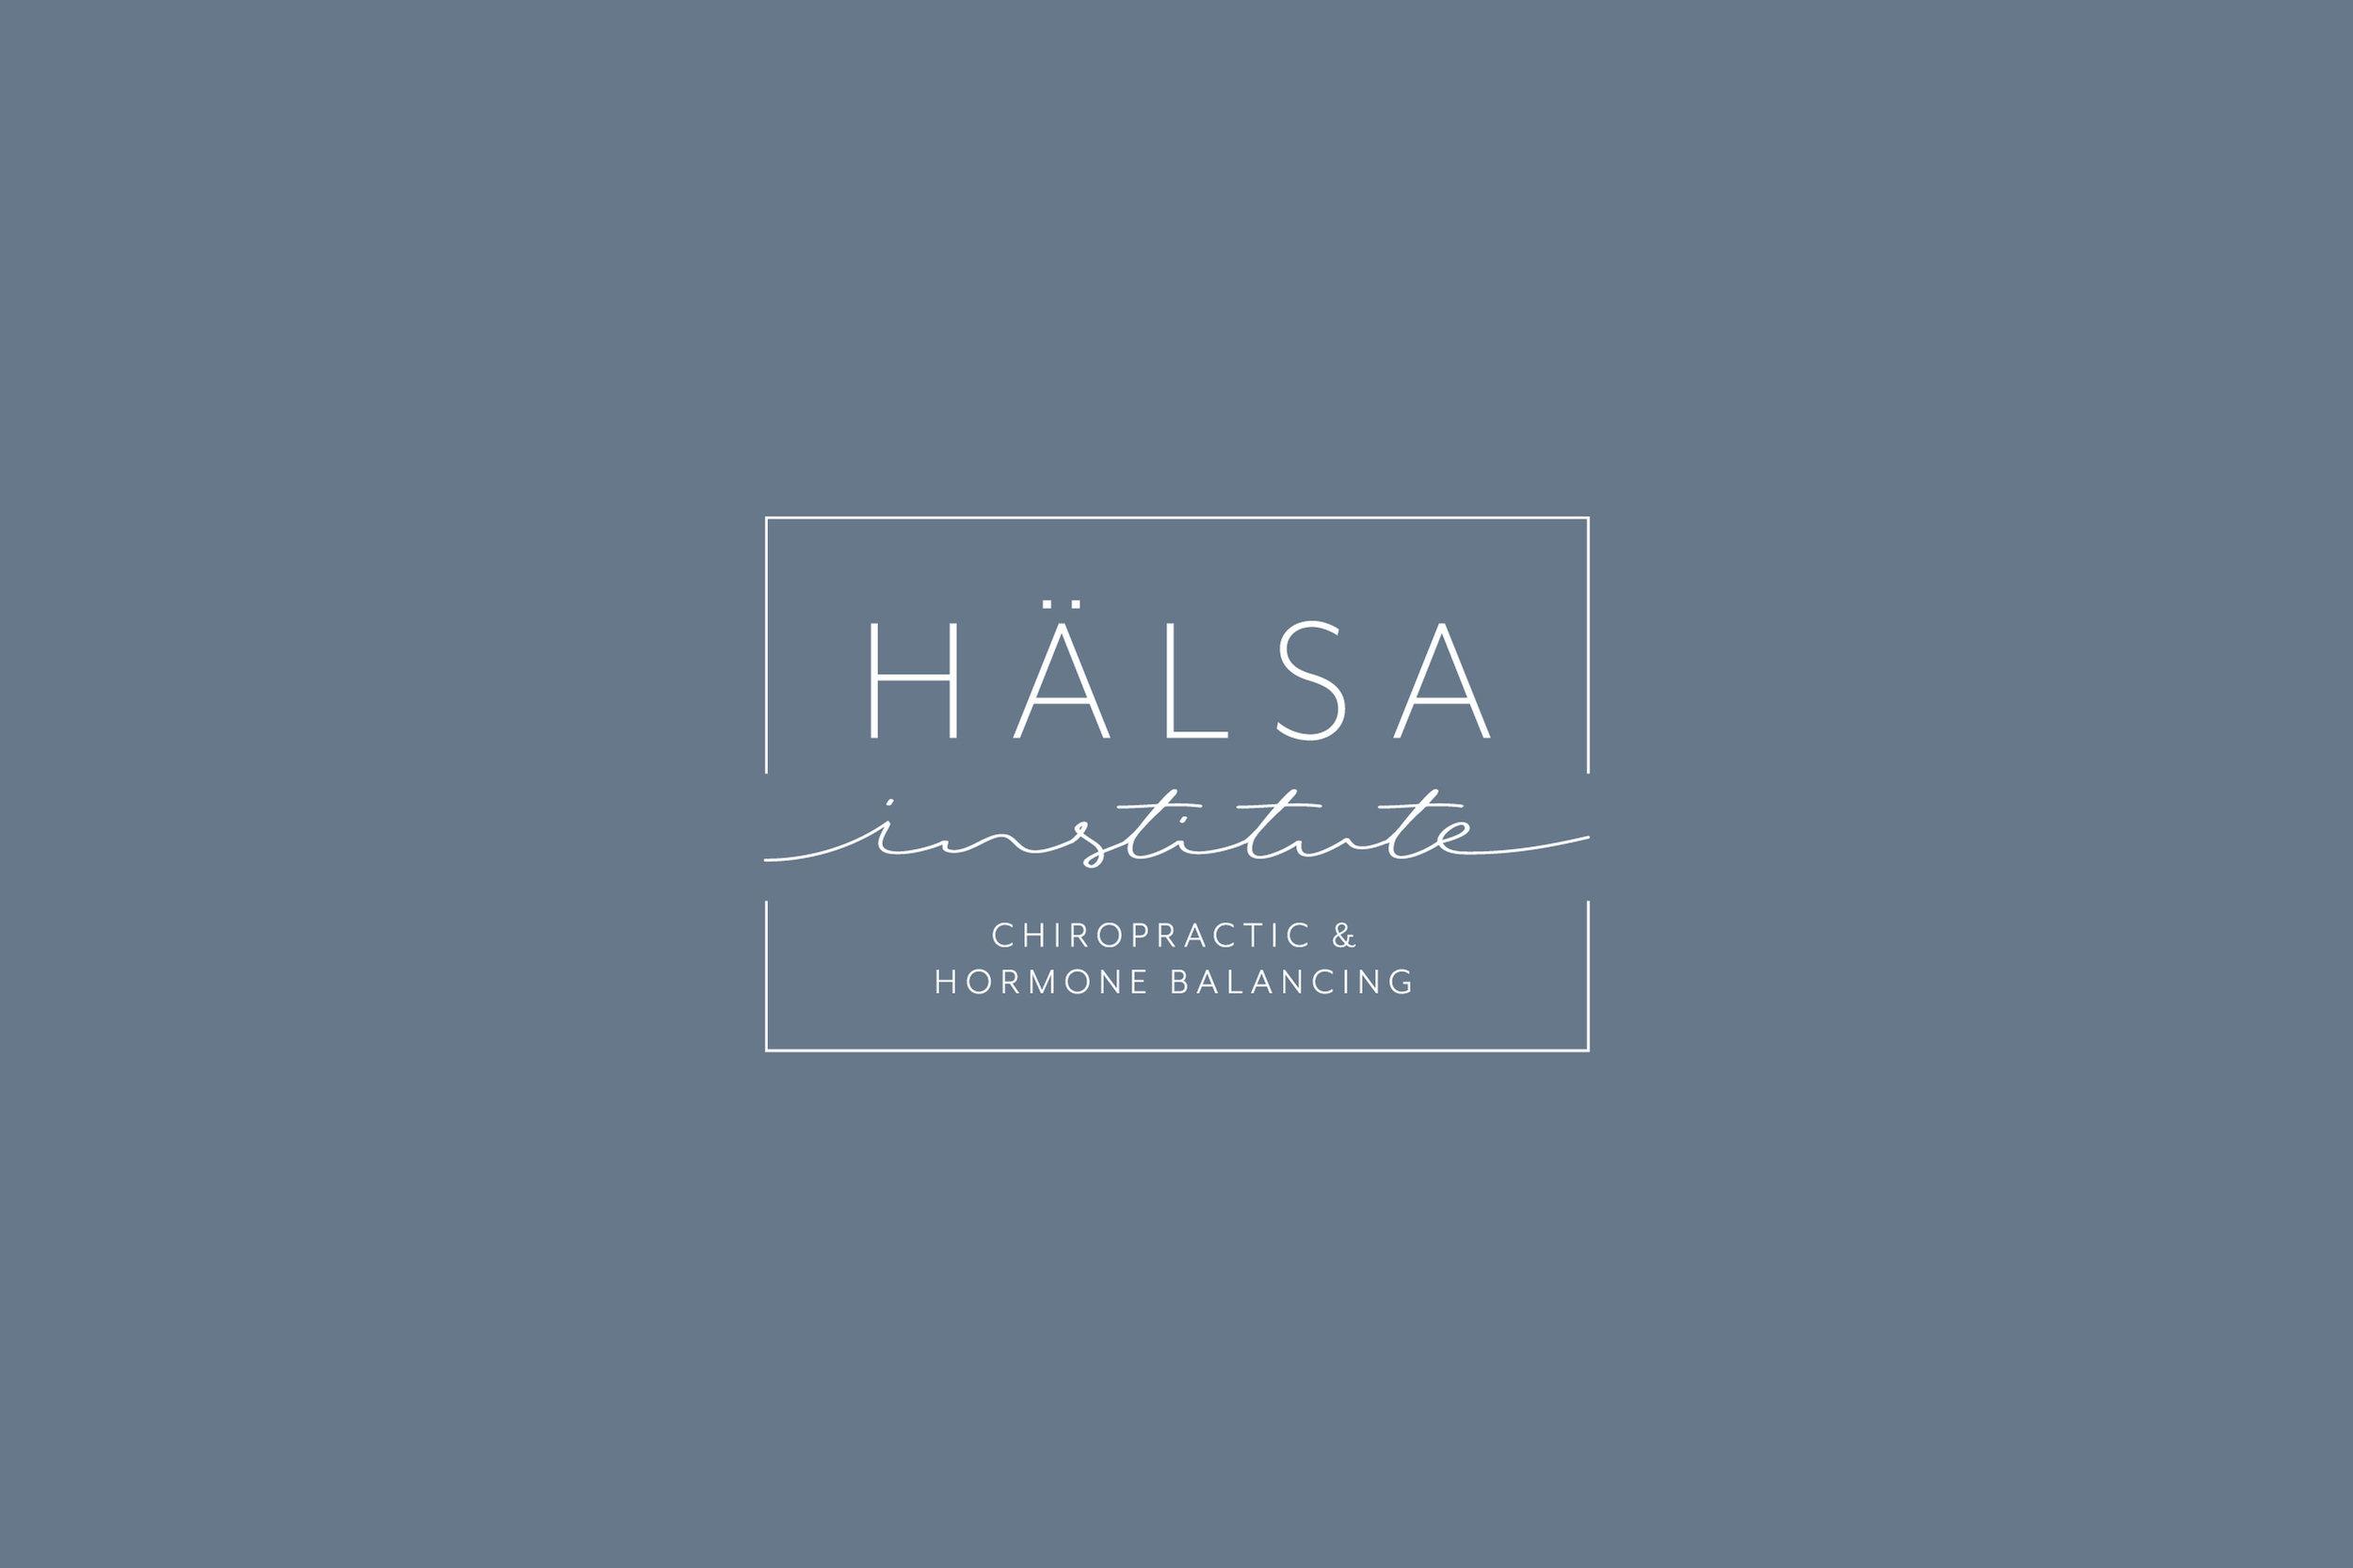 halsa-branding-project-delilah-creative